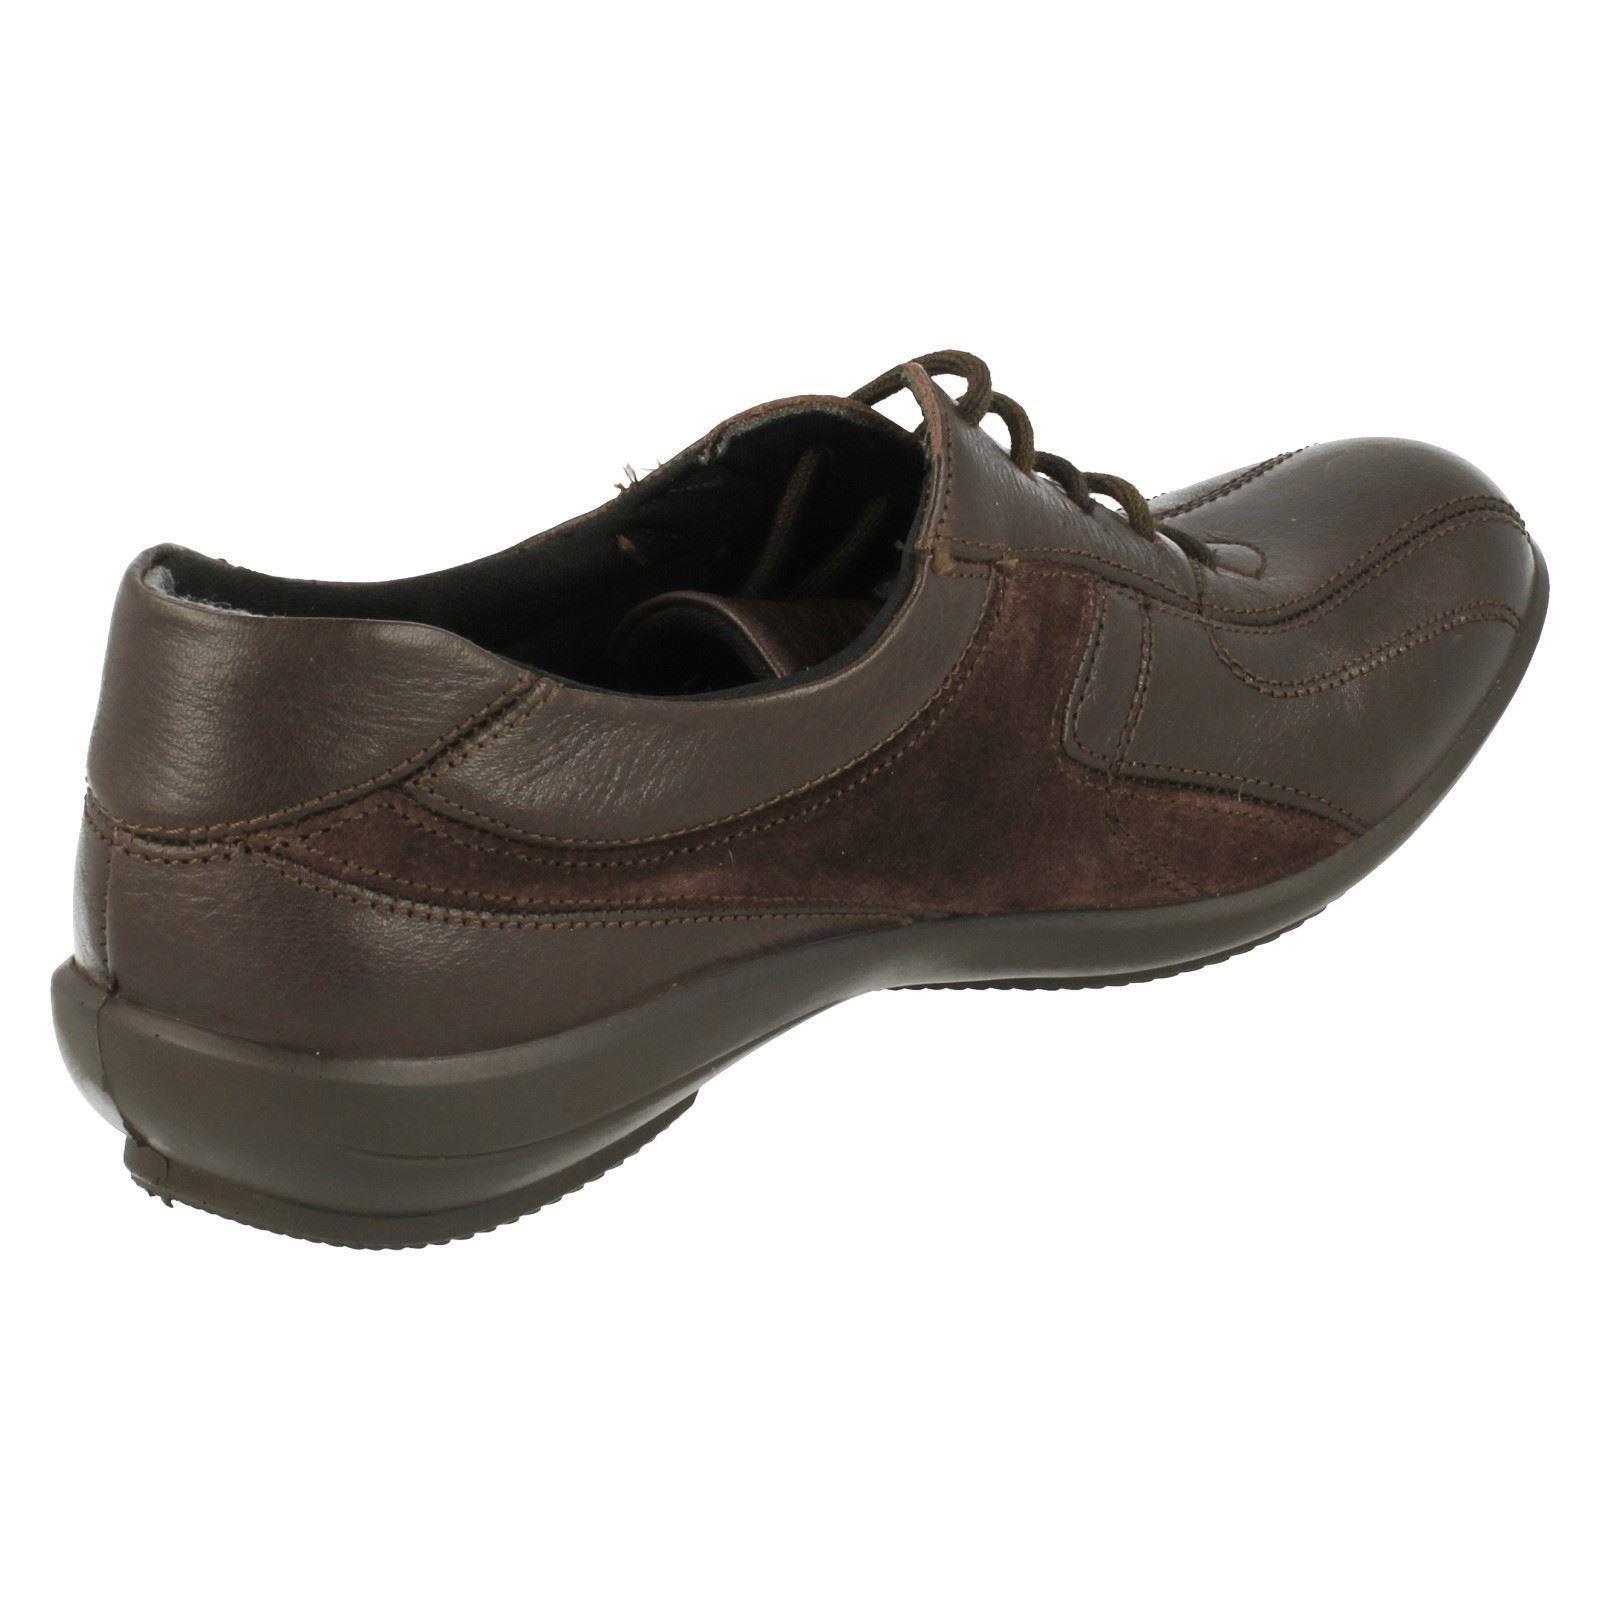 Mujer Easy B Cordones Zapatos de Diario 'em Ma '